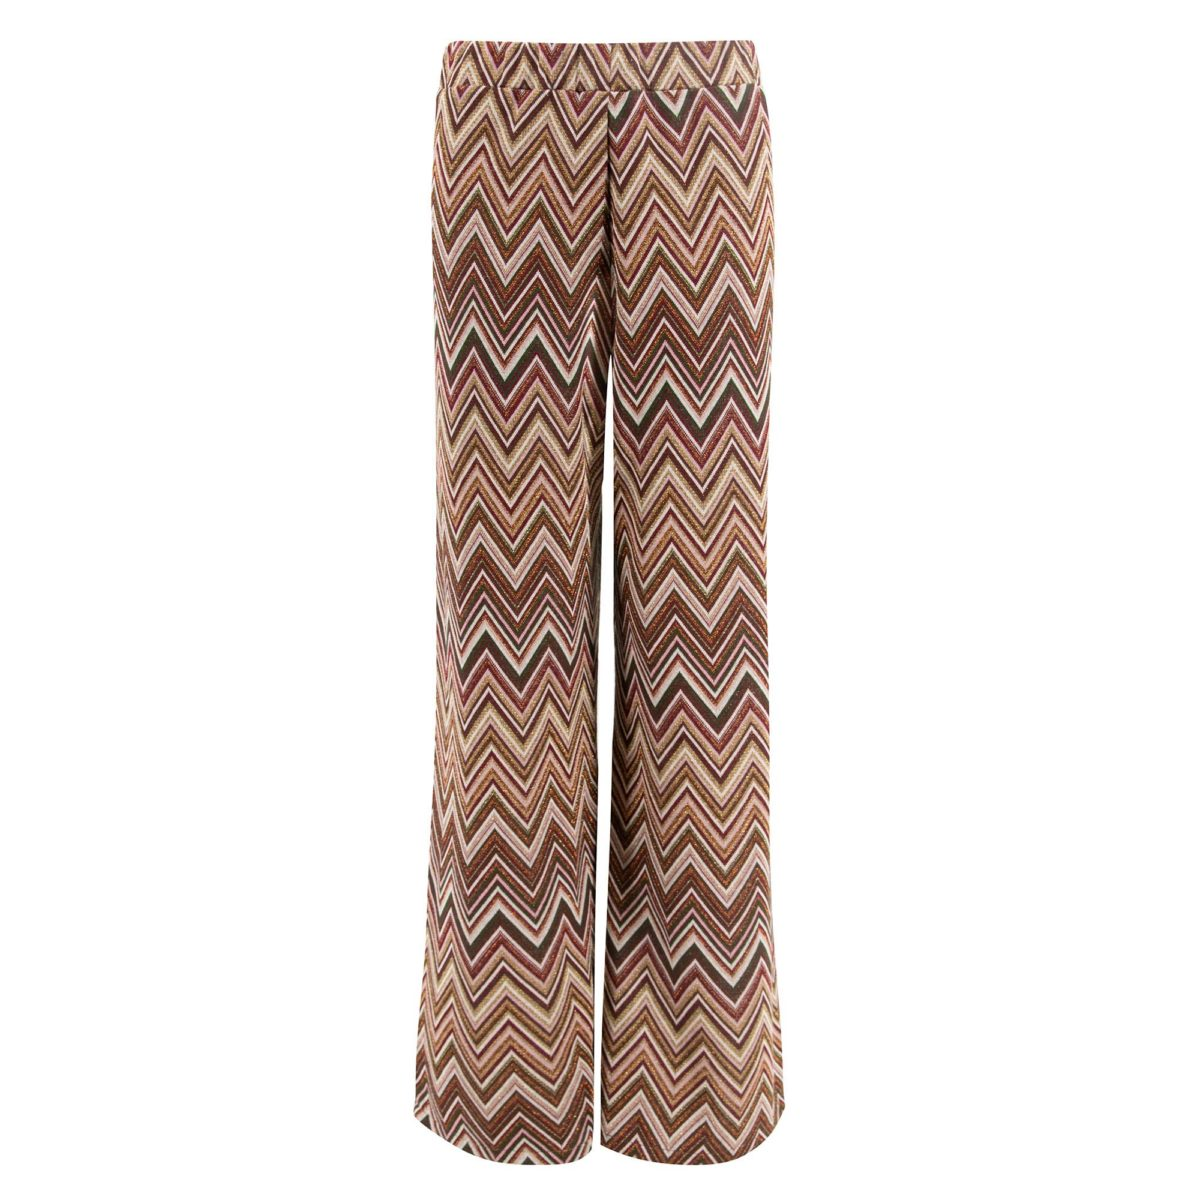 Pantalone Wide leg in maglia Bordeaux - vista frontale | Nicla